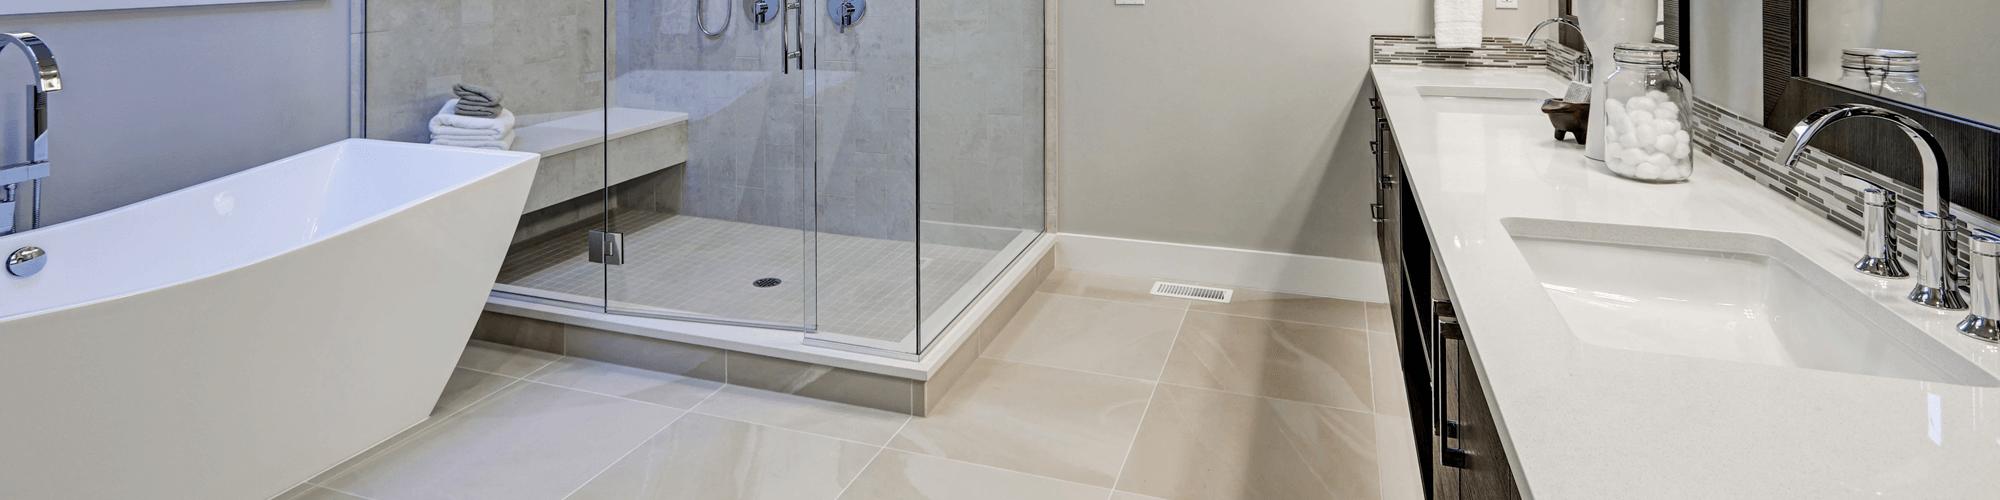 heated tile floor installation in